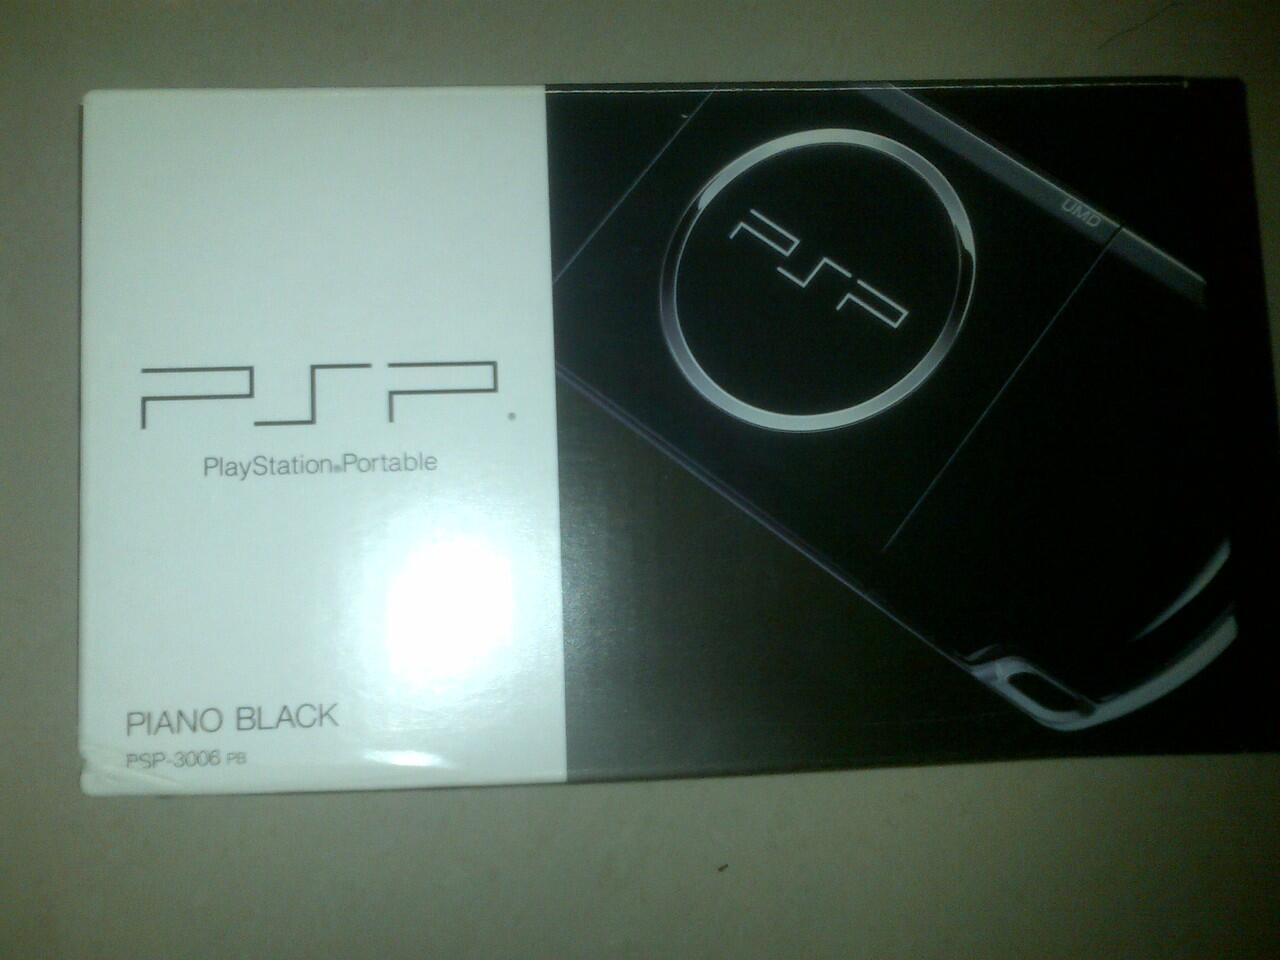 Jual PSP 3006 PB, Headset Razor Kraken Pro dan Kana Dota 2 mouse. Barang second.